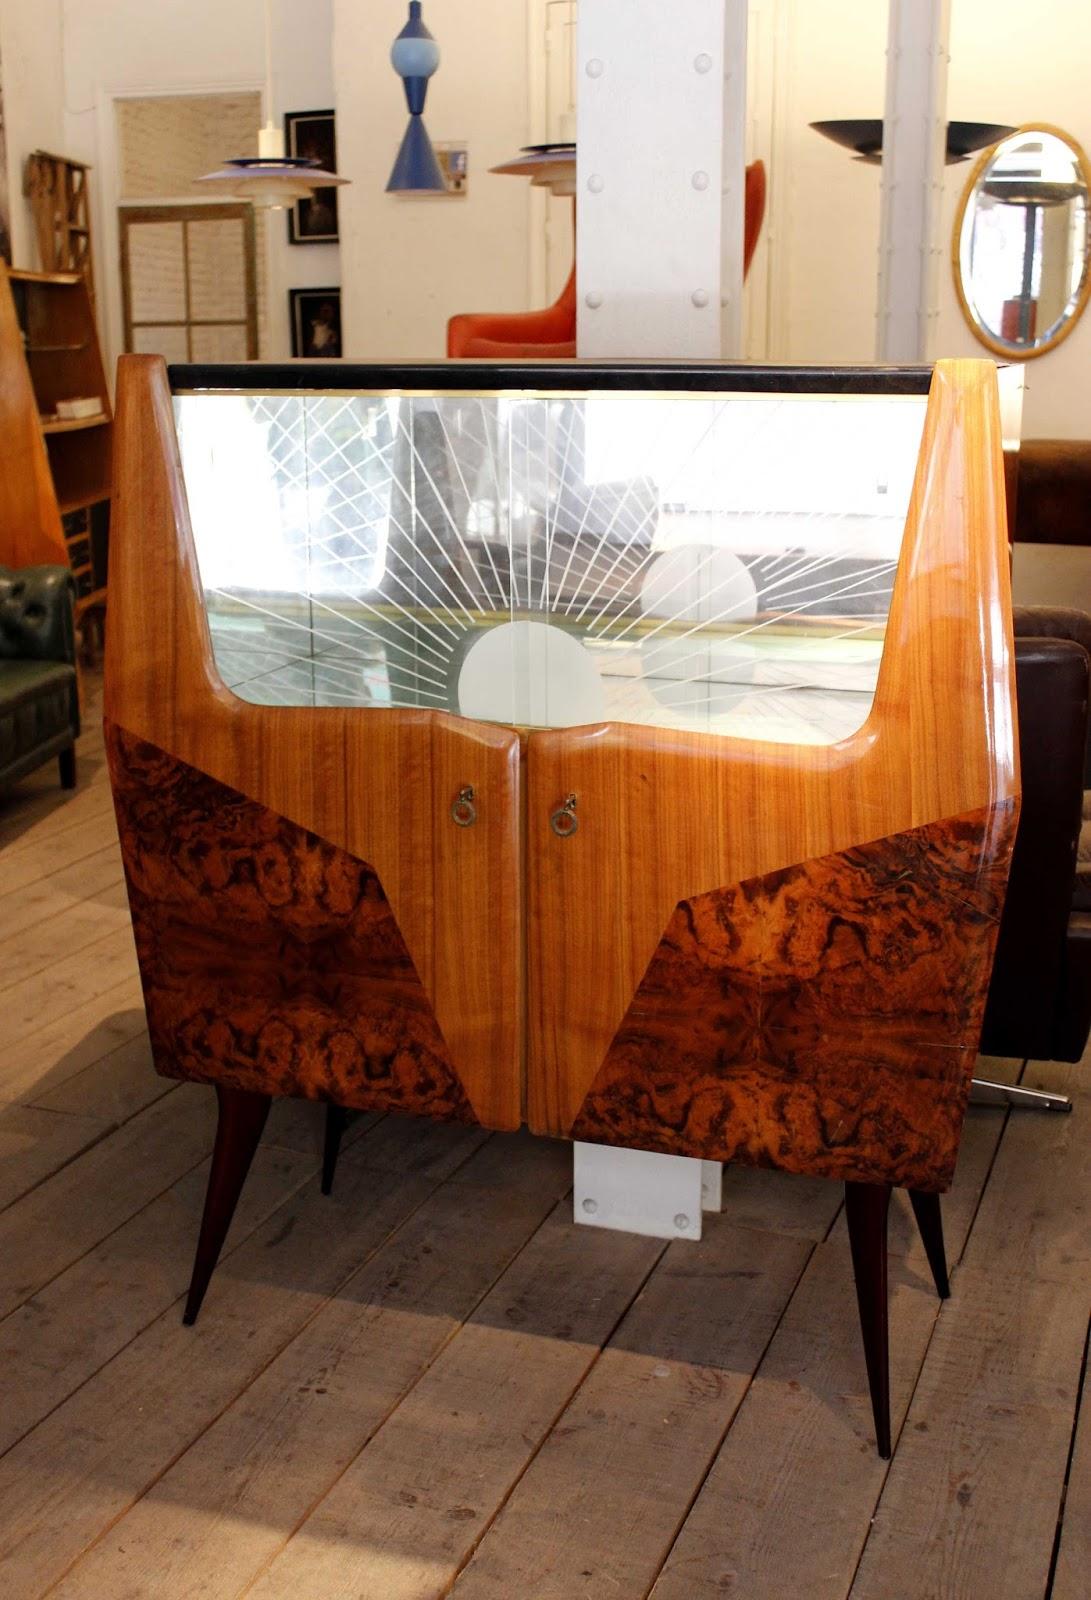 Muebles Daneses Madrid La Firma Danesa De Muebles Plantea Sus  # Muebles Mocholi